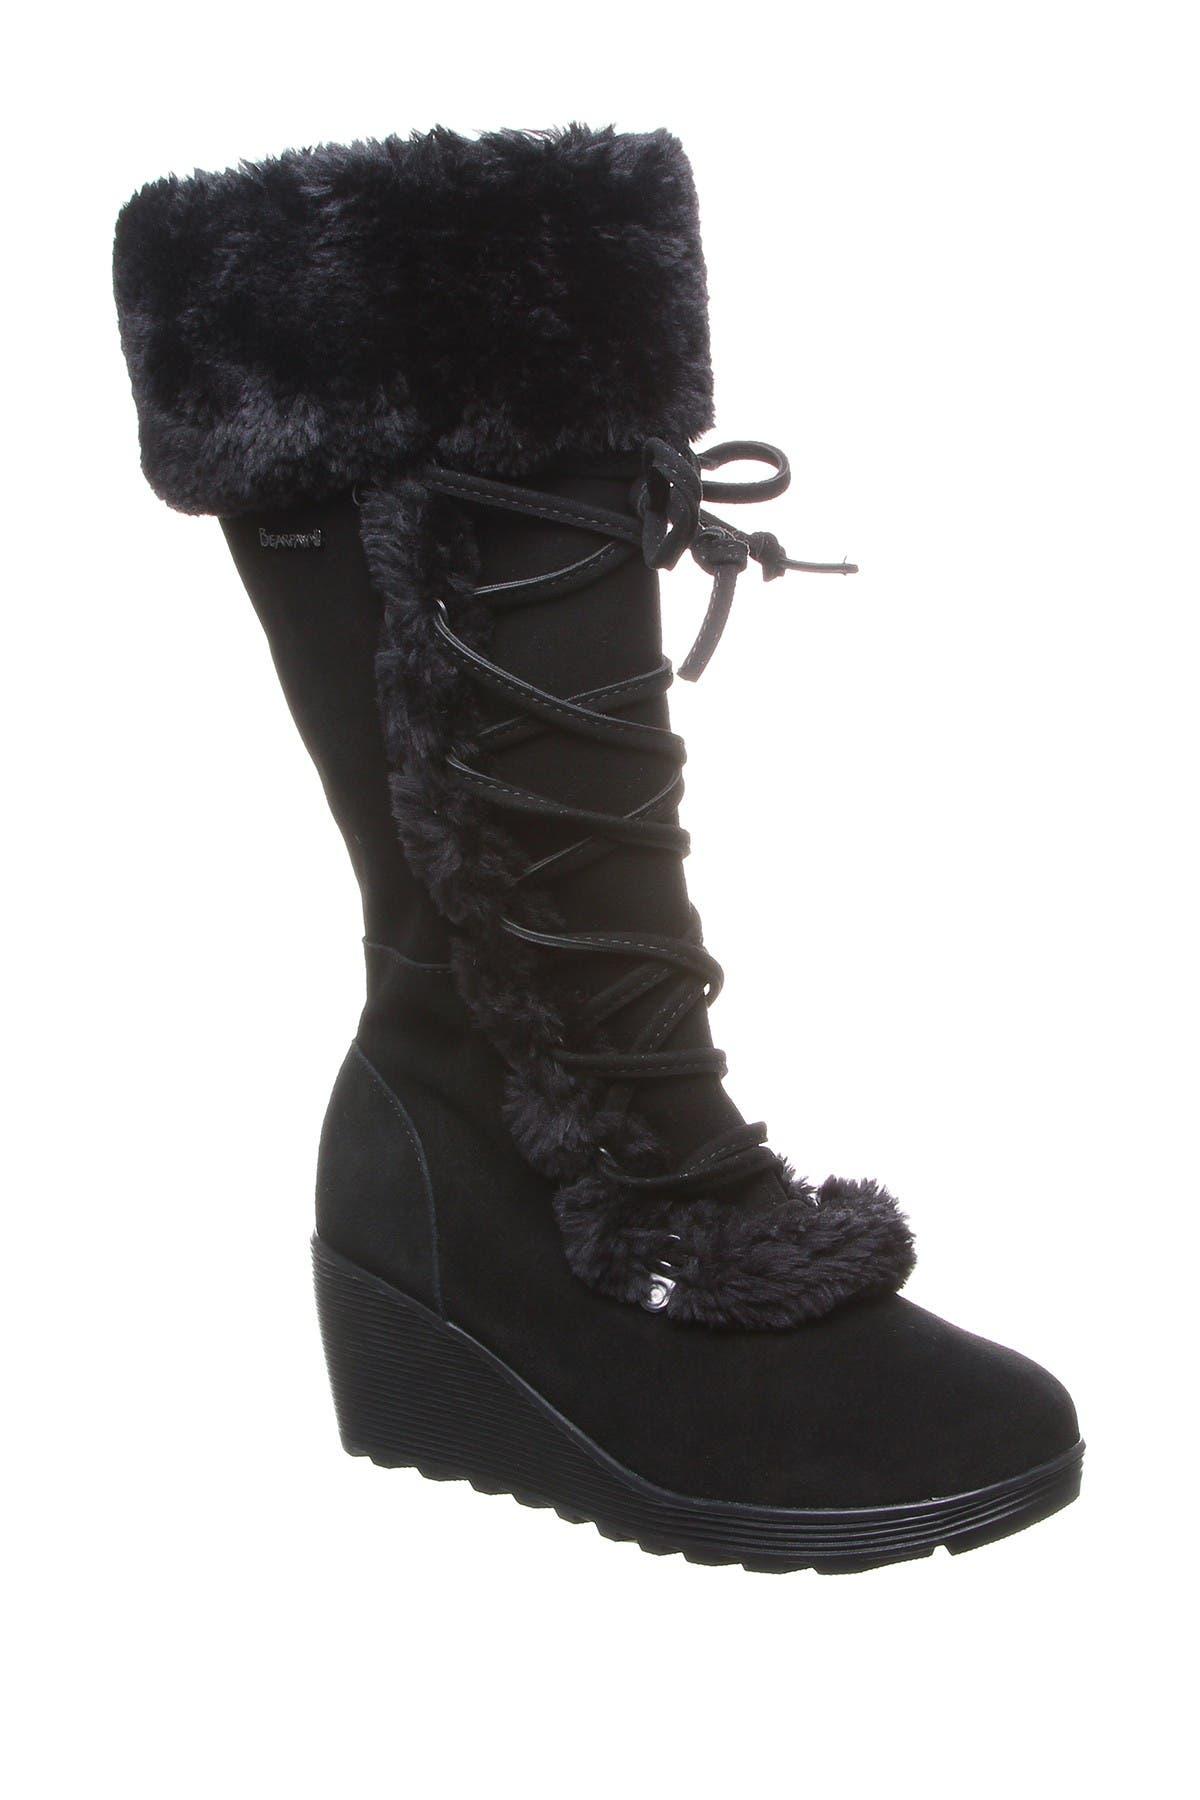 Image of BEARPAW Minka Faux Fur Suede Tall Boot